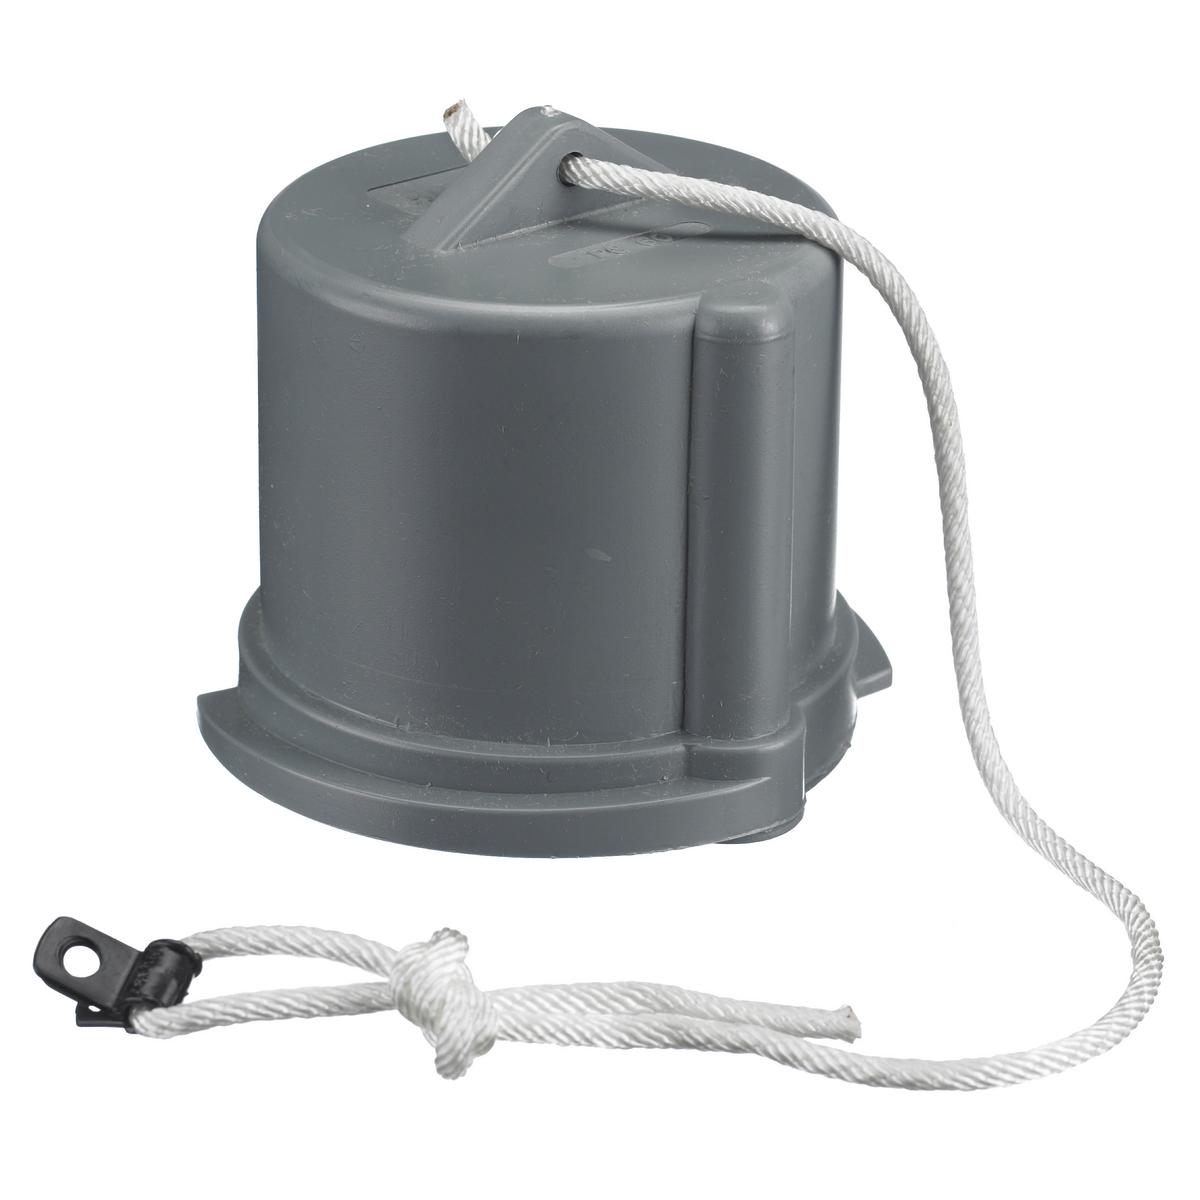 Hubbell PC60 Watertight IEC Pin and Sleeve Closure Cap